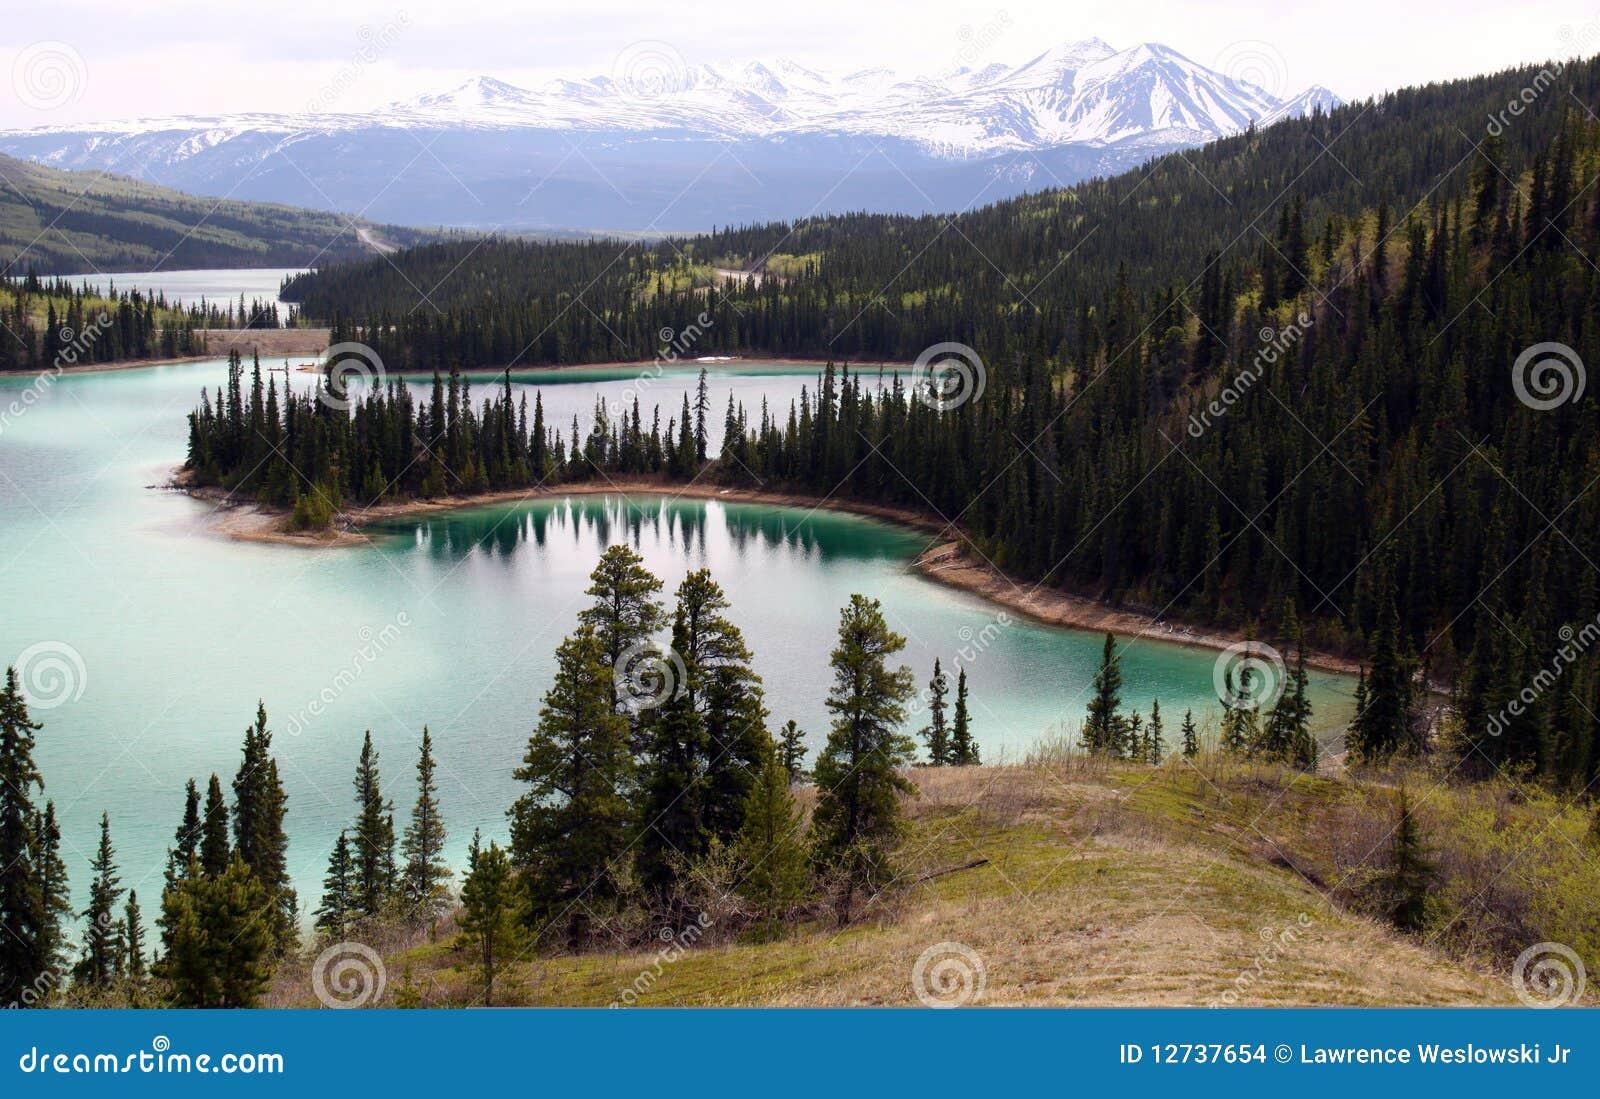 Kanada smaragdlake yukon